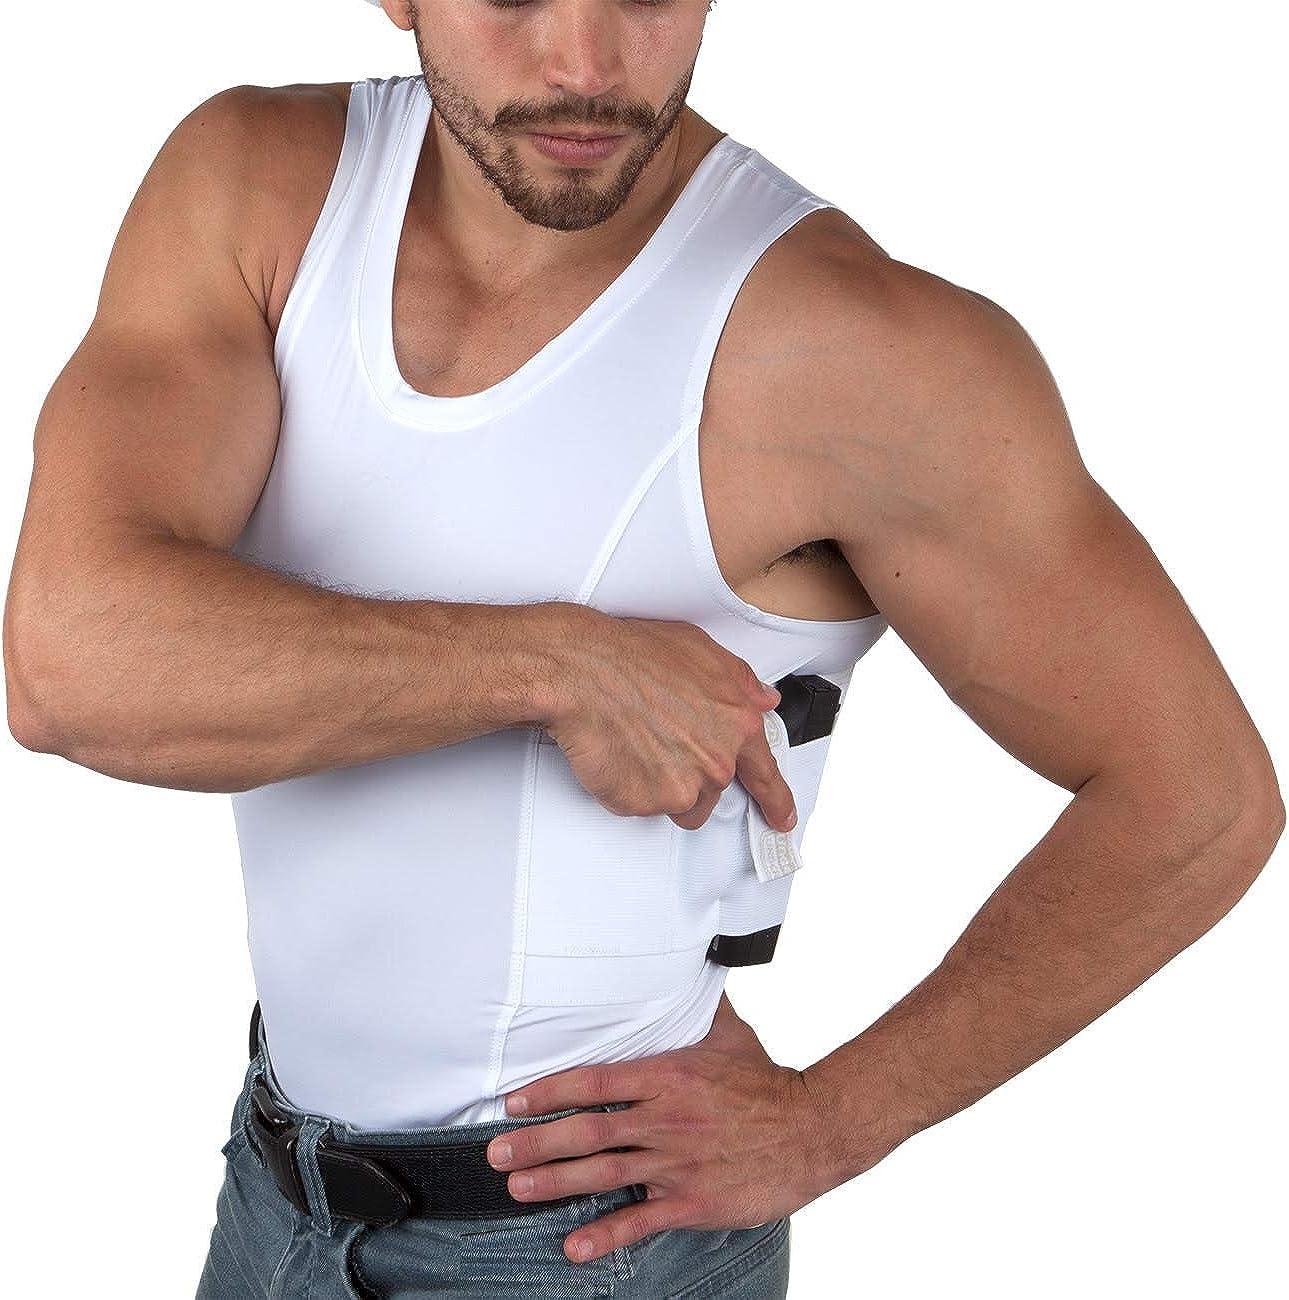 Medium Men/'s Undertech Undercover Conceal Pockets Tank Top Travel T-shirt White